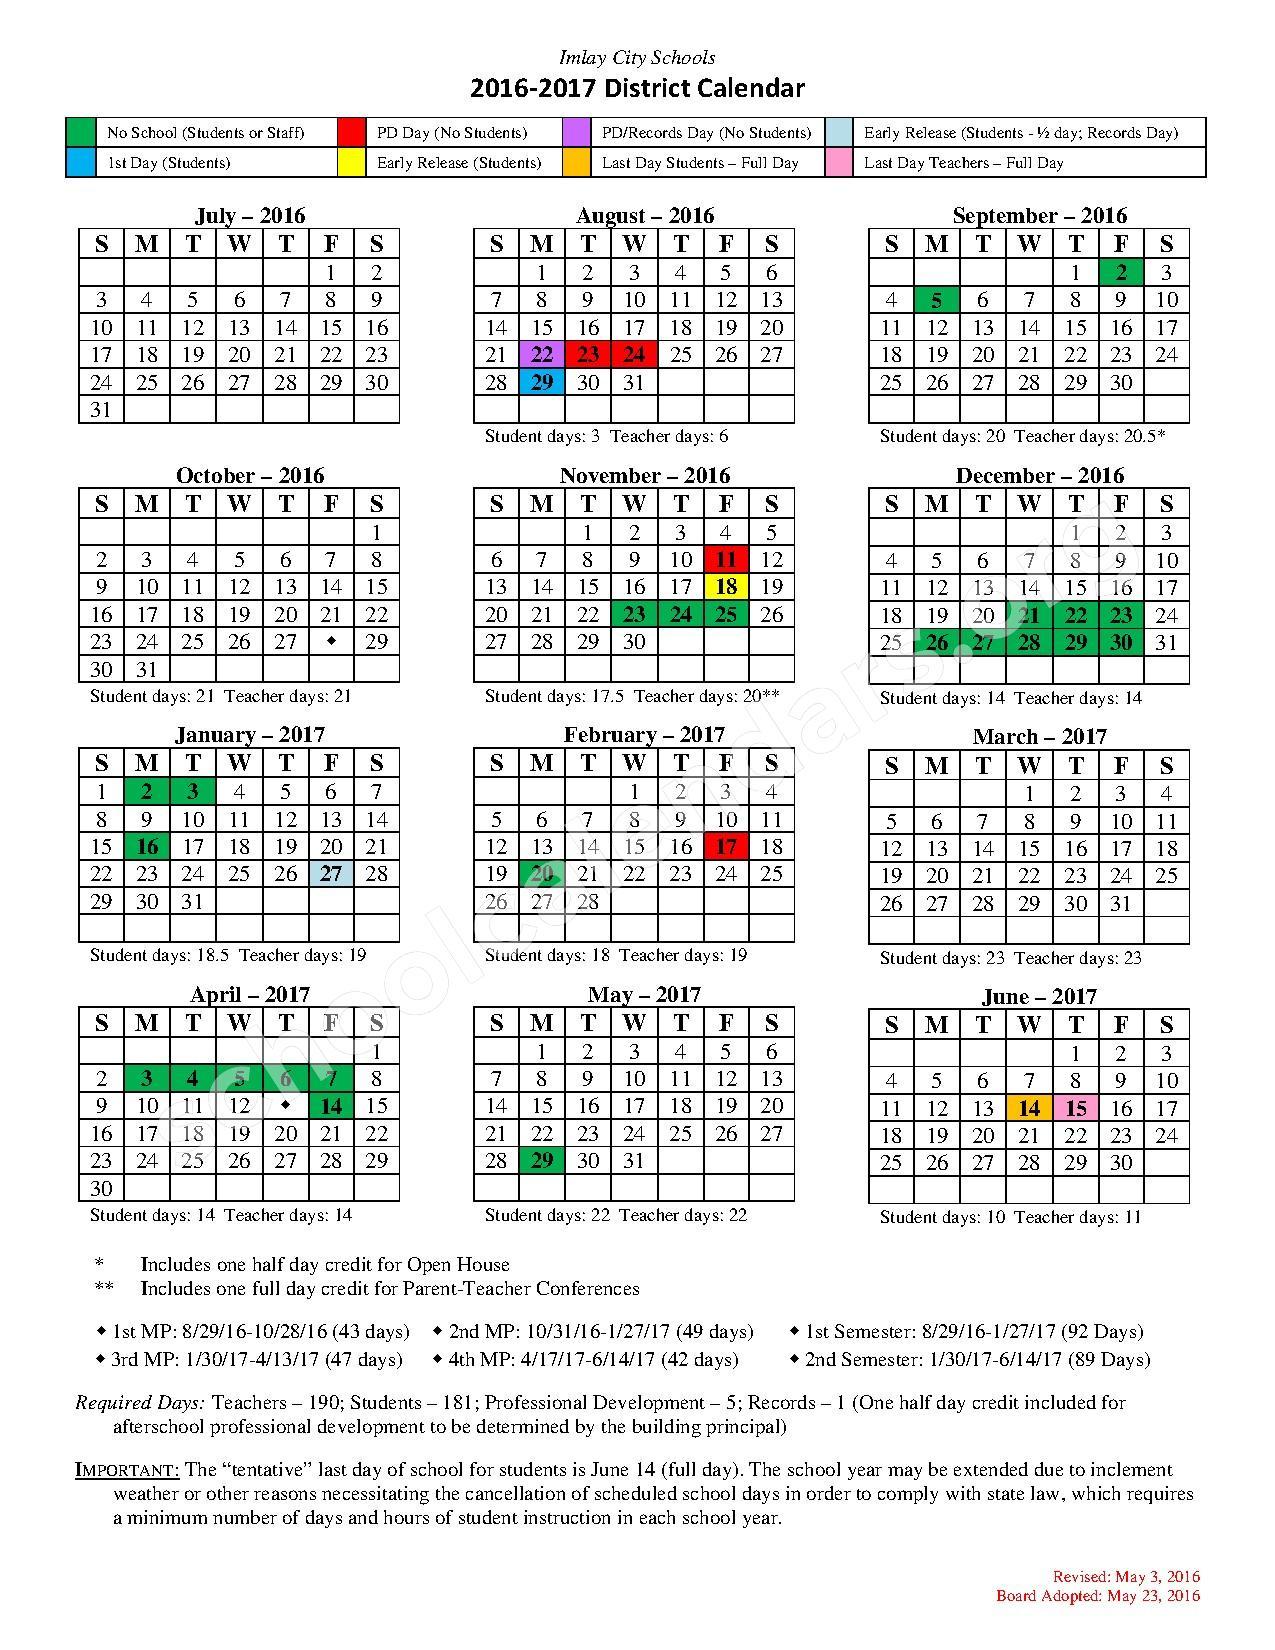 2016 - 2017 School Calendar – Imlay City Community Schools – page 1